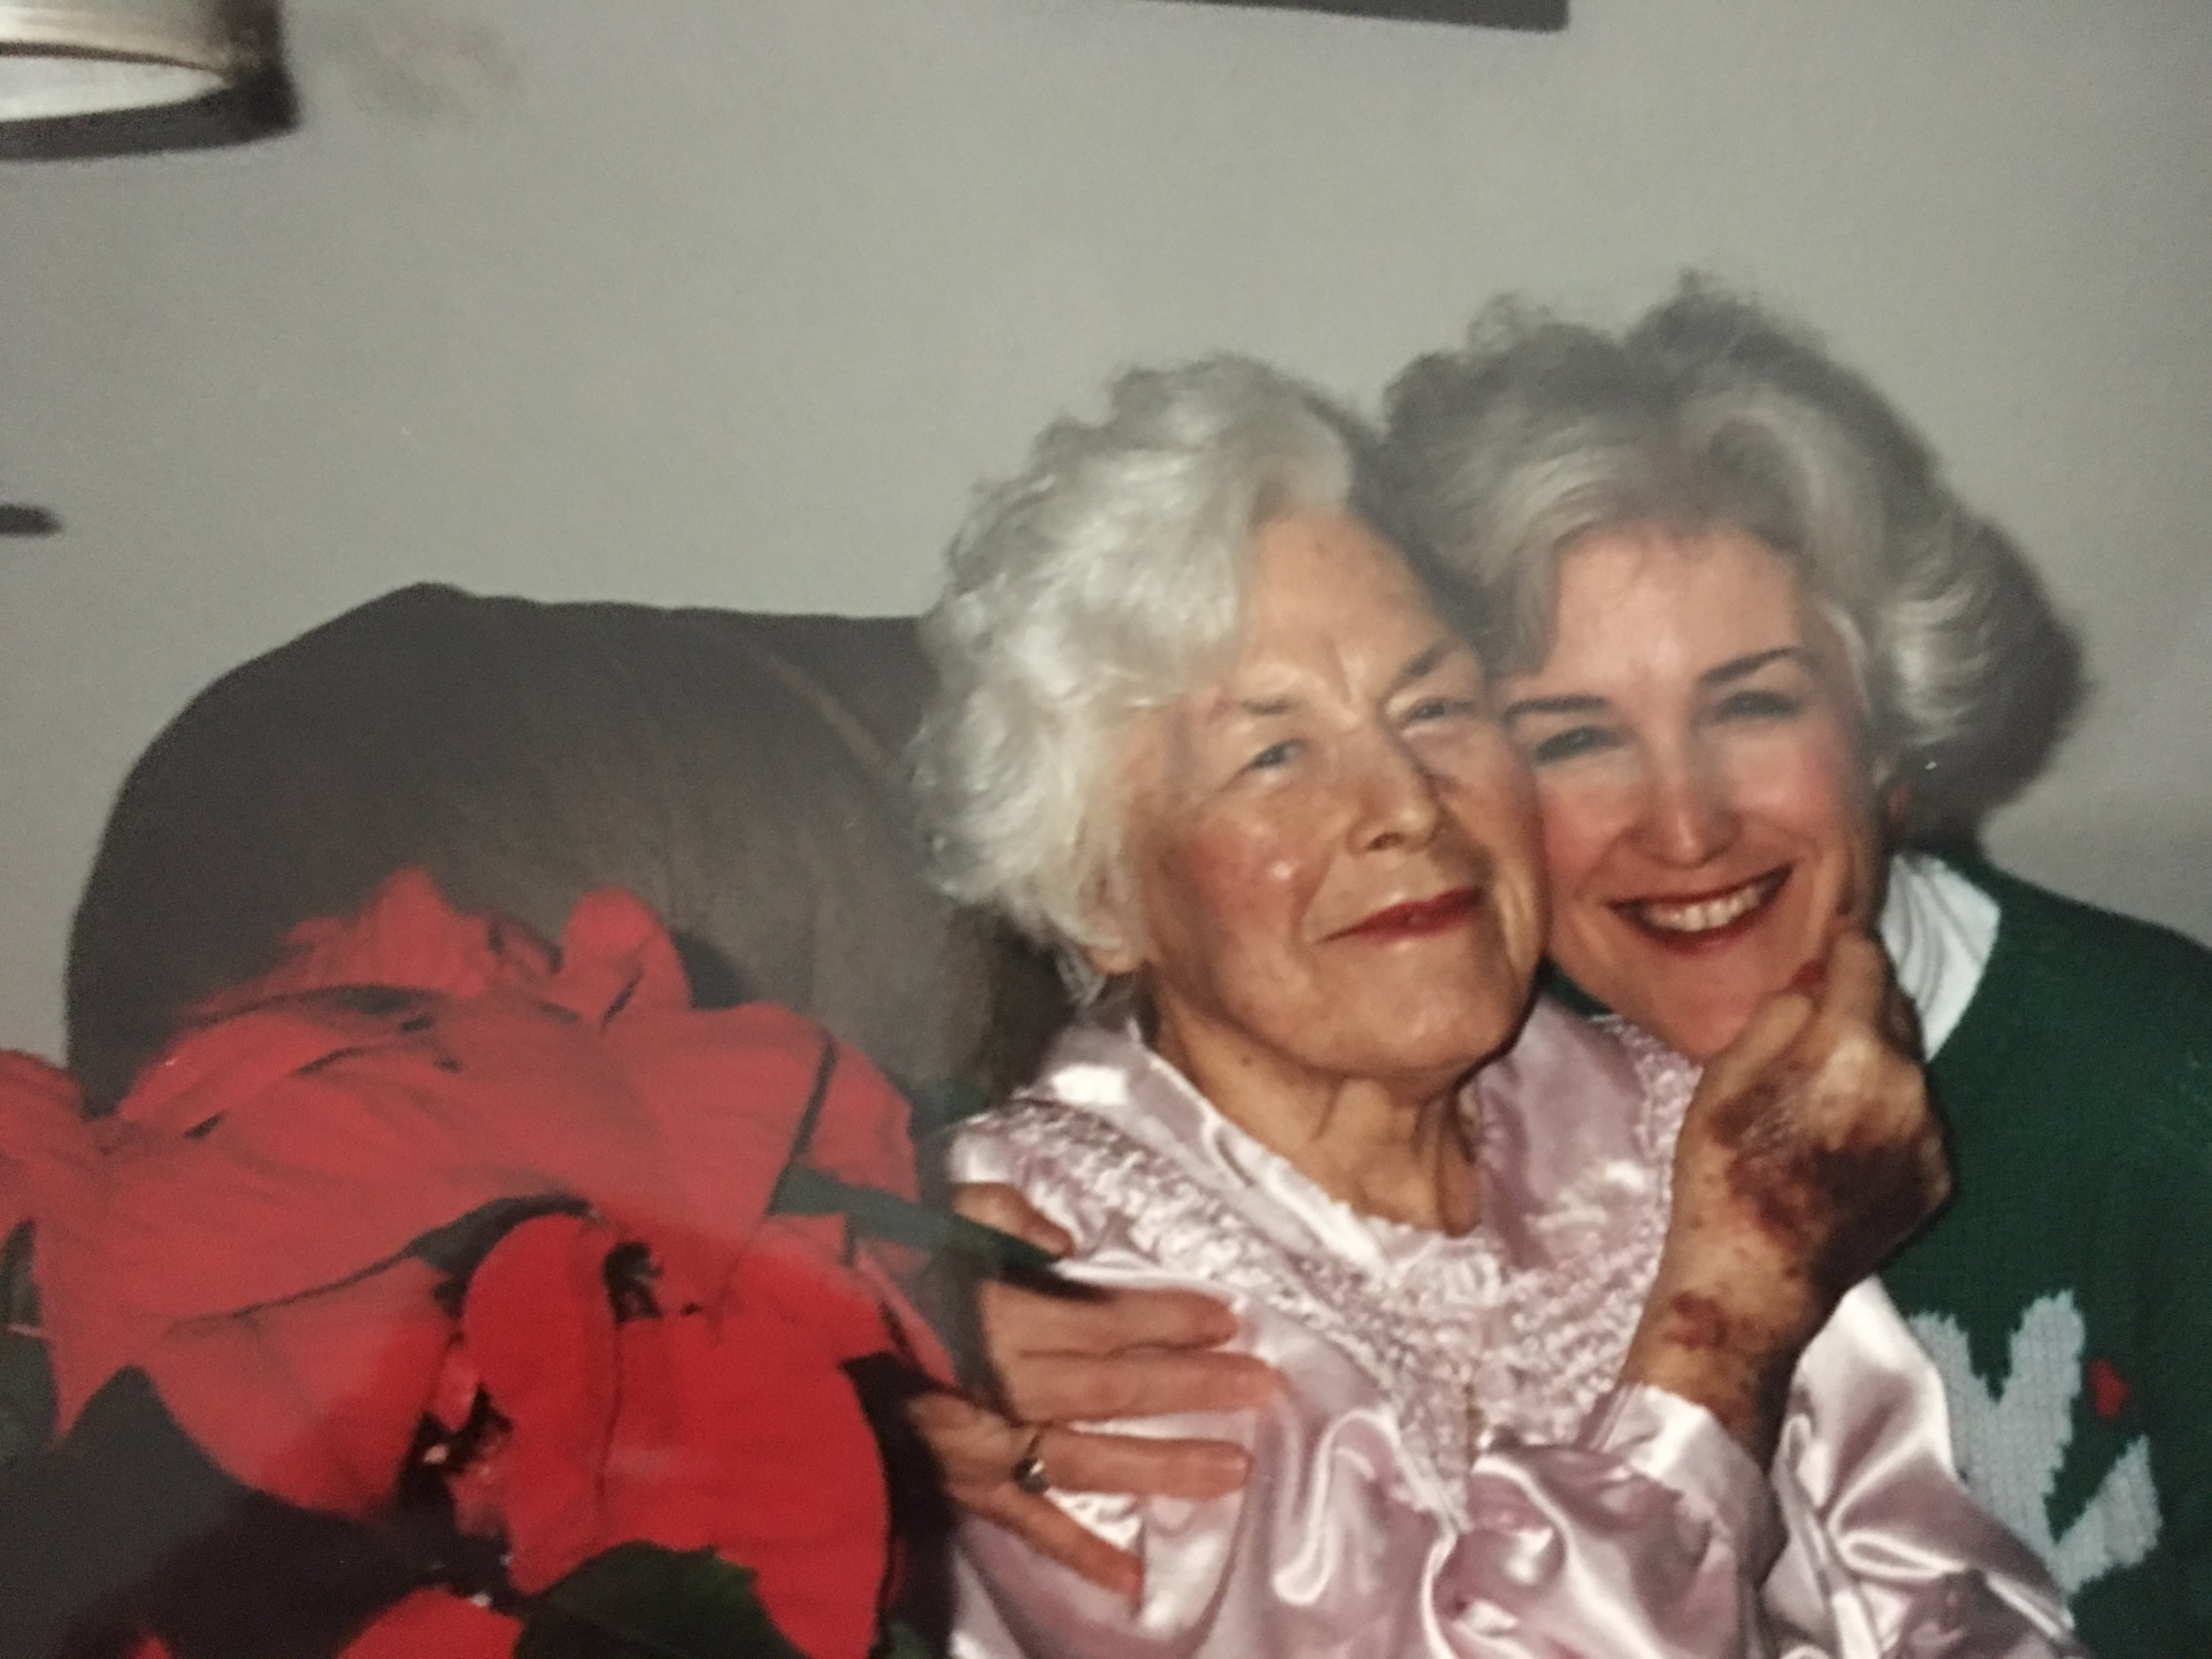 My mom and her mom, Nana.